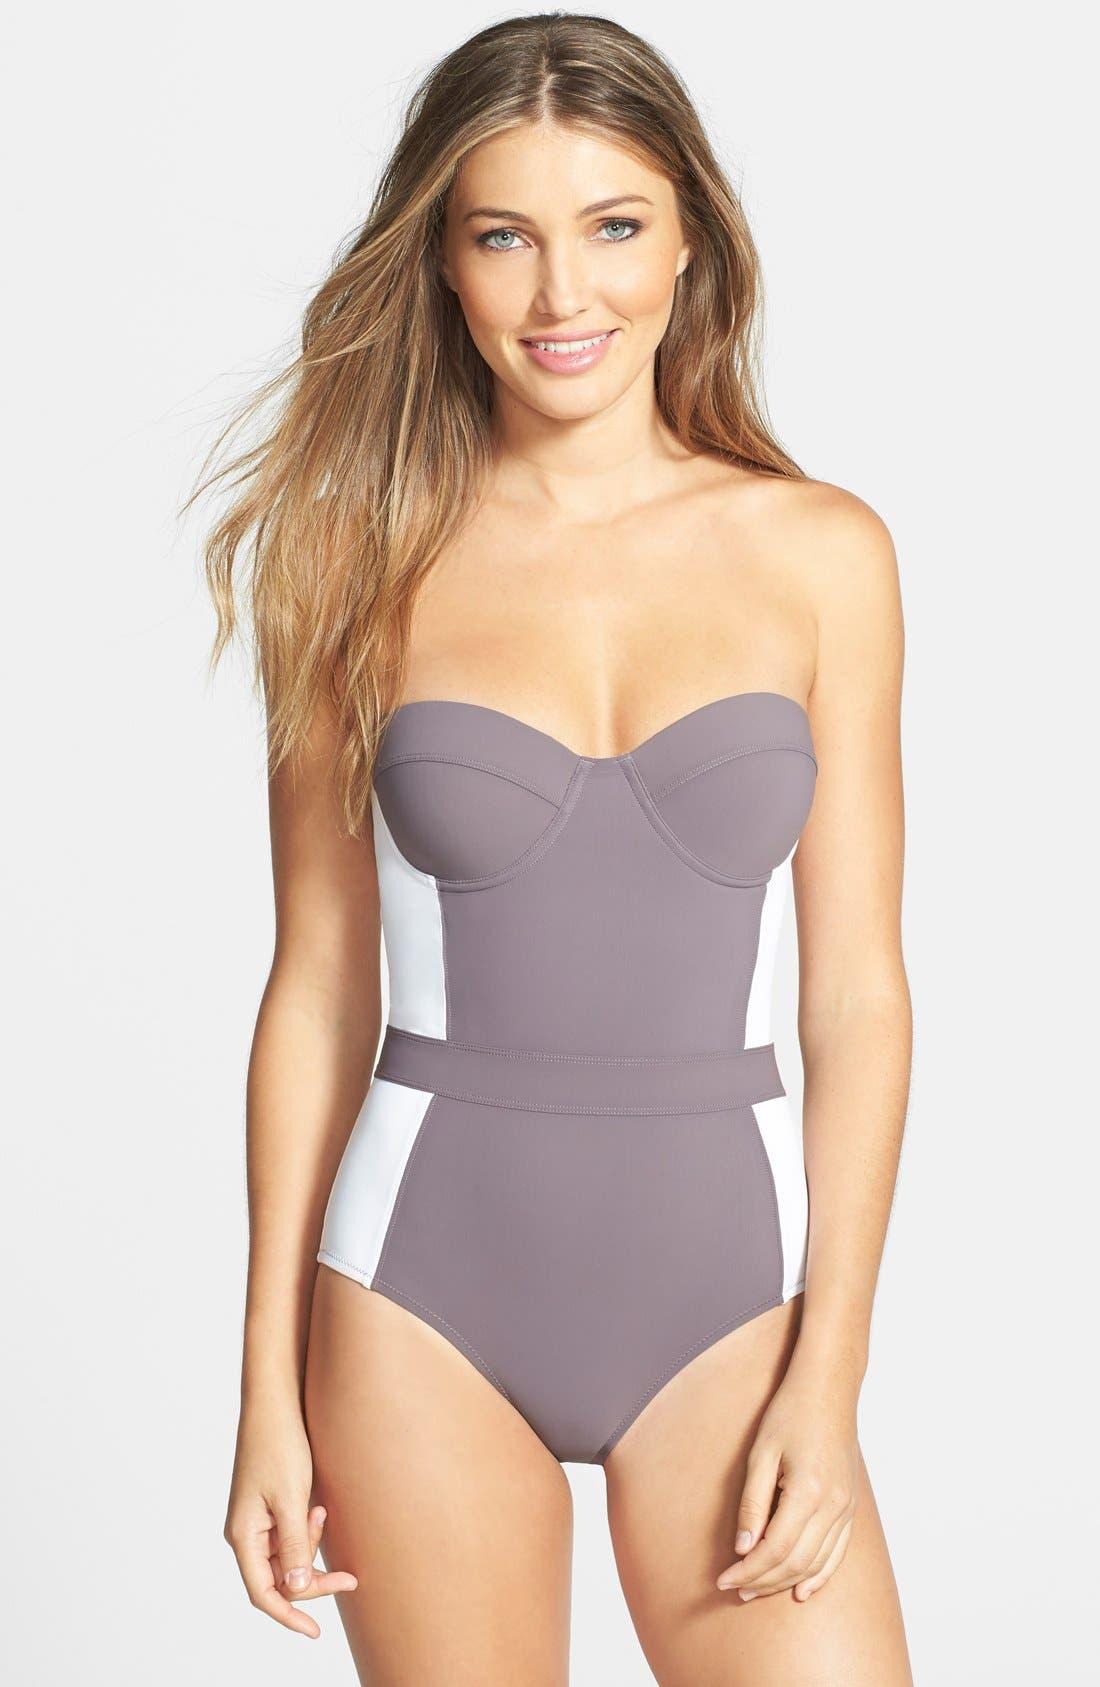 Main Image - Tory Burch 'Lipsi' Colorblock One-Piece Swimsuit